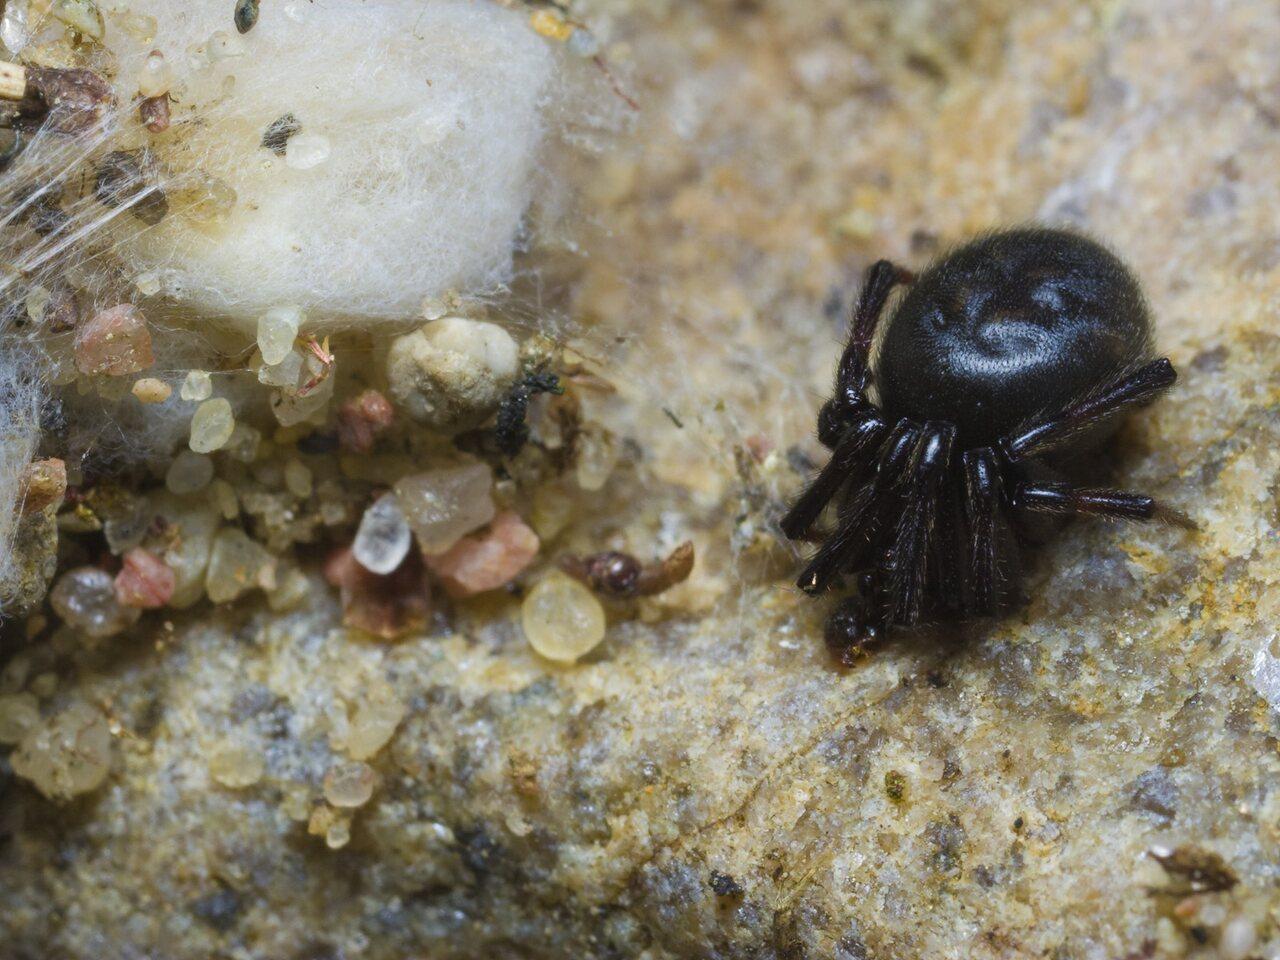 Steatoda-albomaculata-0670.jpg